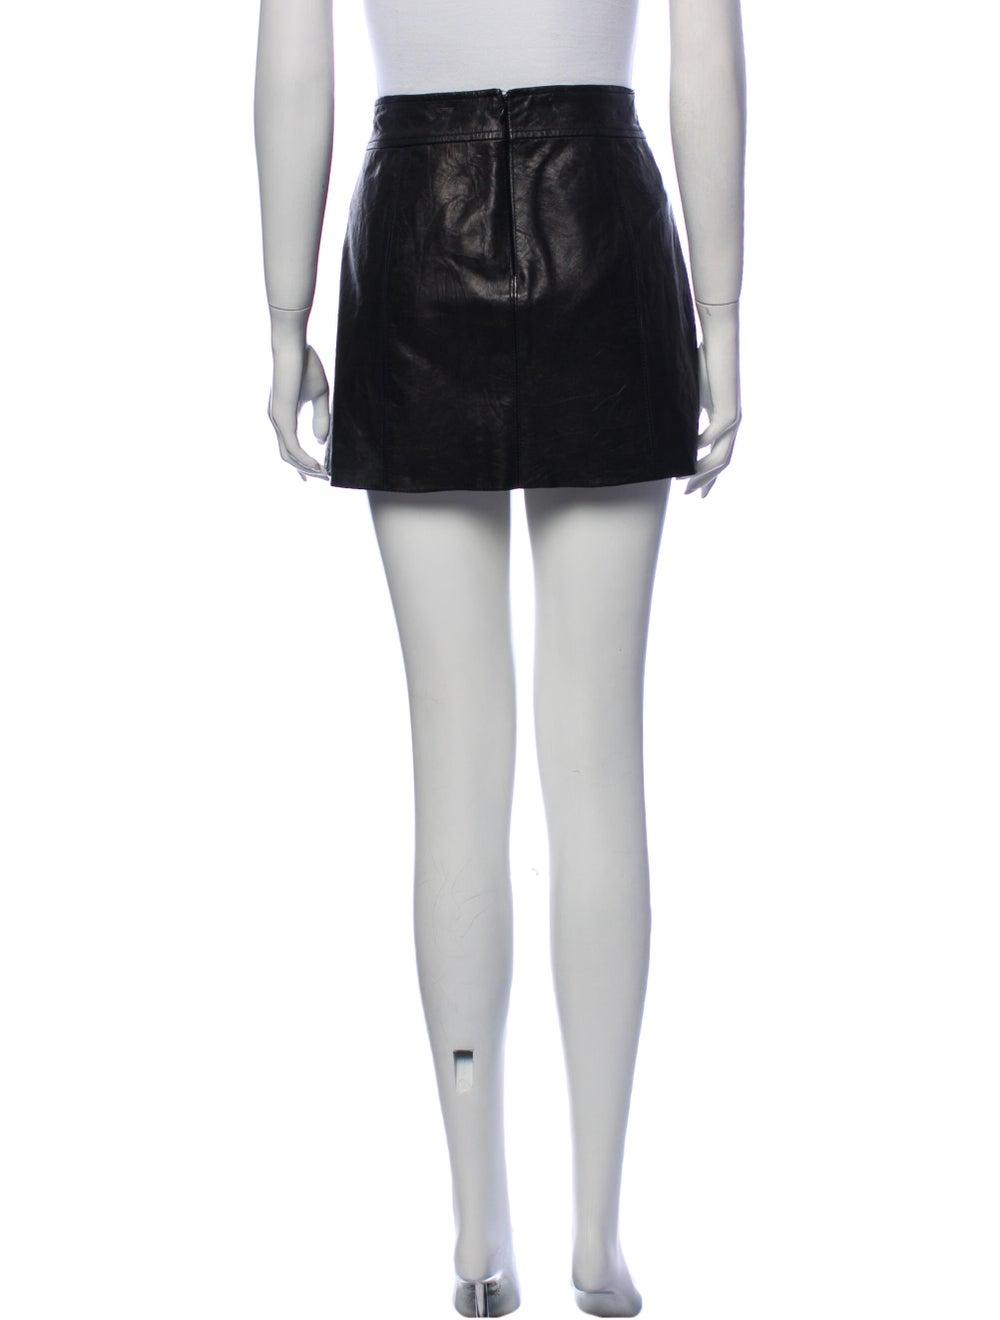 Theory Leather Mini Skirt Black - image 3